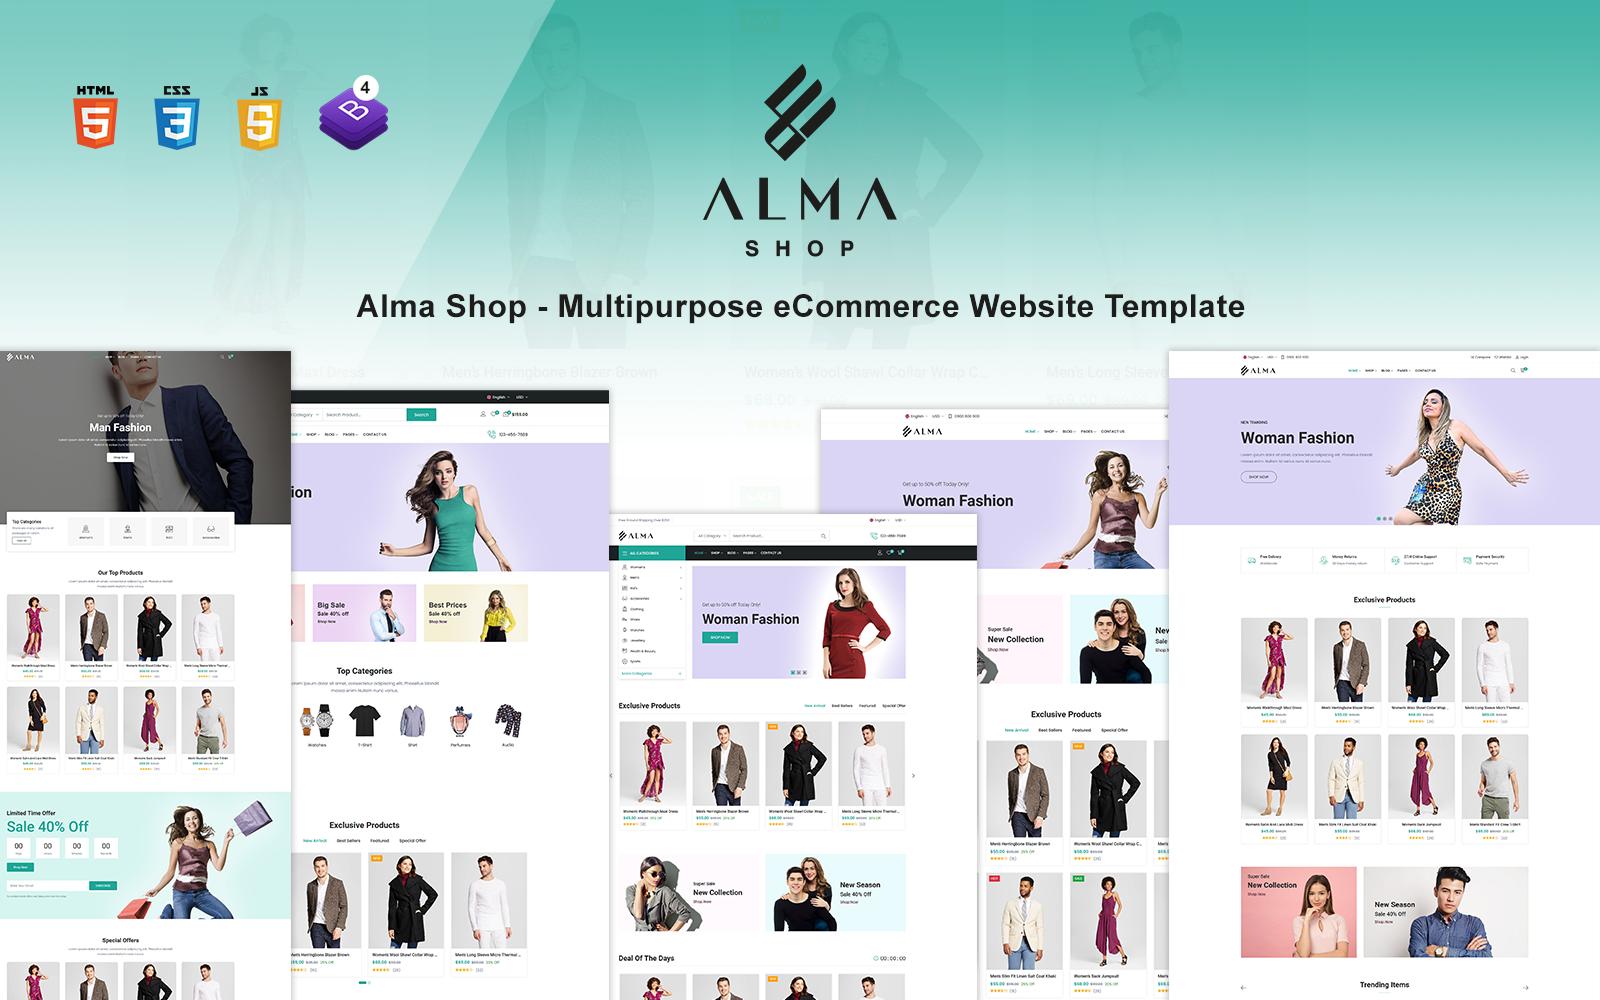 Alma Shop - Multipurpose eCommerce Website Template